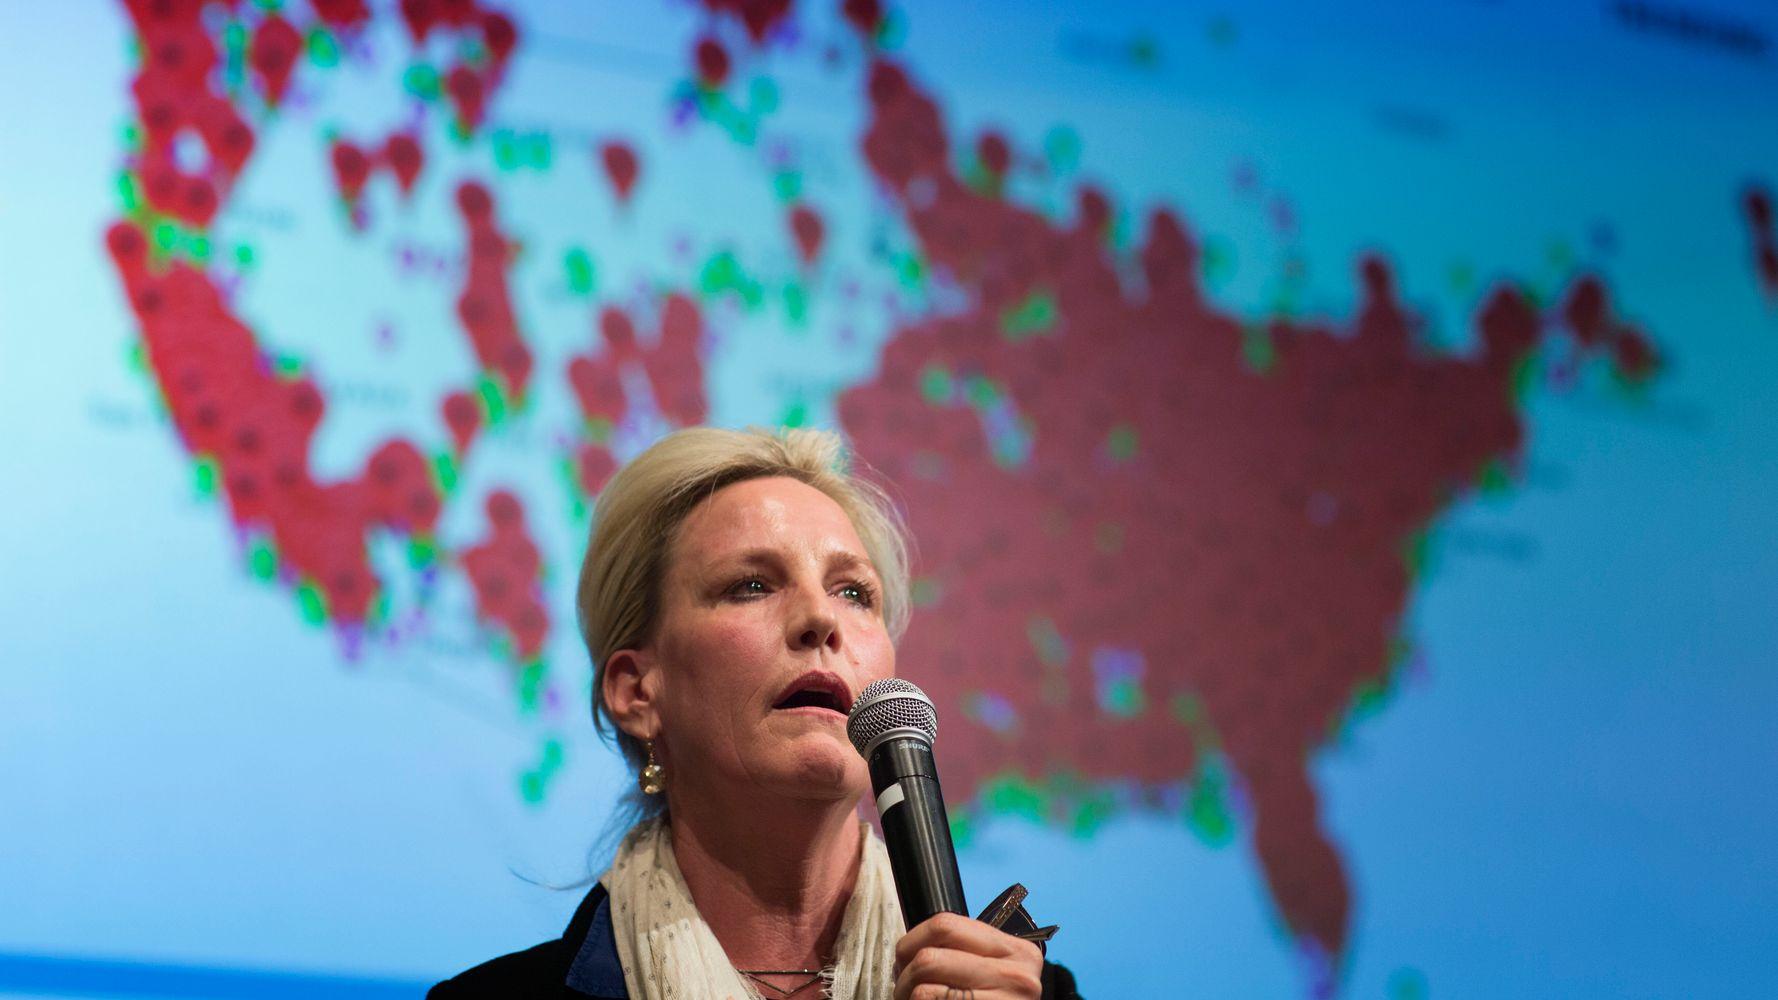 Erin Brockovich Slams Joe Biden's EPA Pick: 'Are You Kidding Me?'